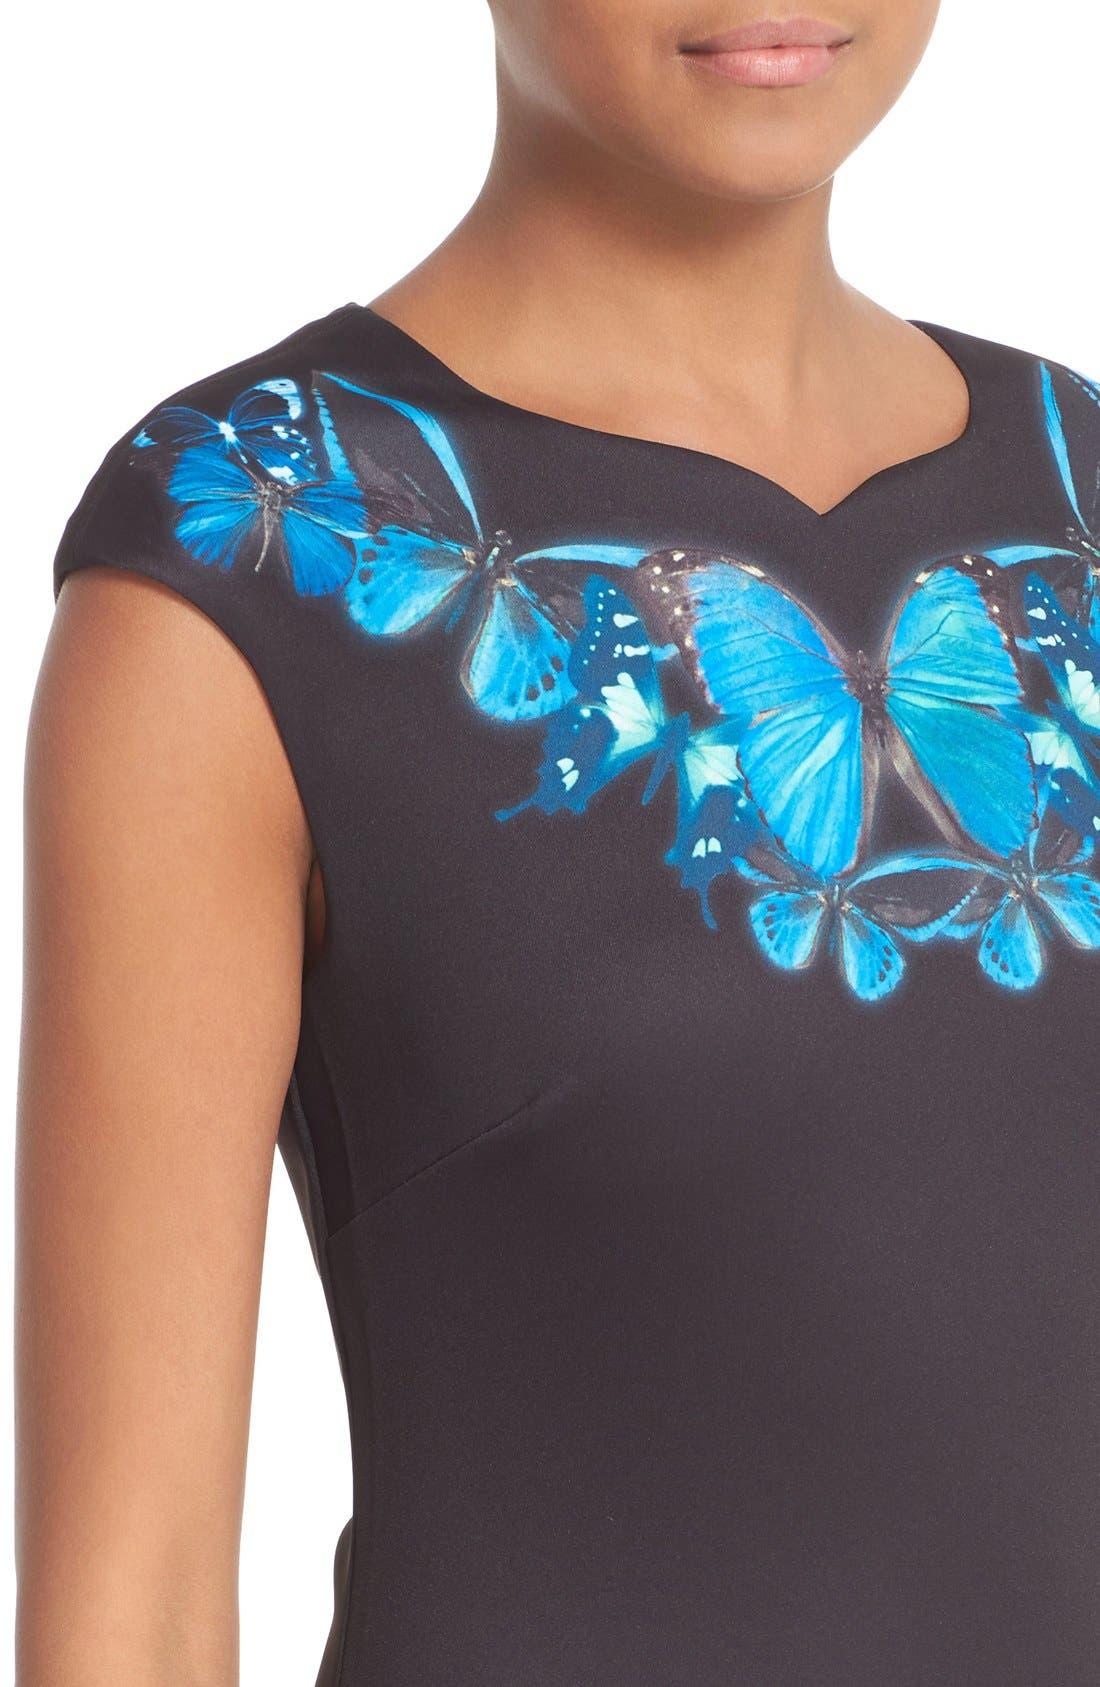 'Ashley - Butterfly Necklace' Sheath Dress,                             Alternate thumbnail 2, color,                             001